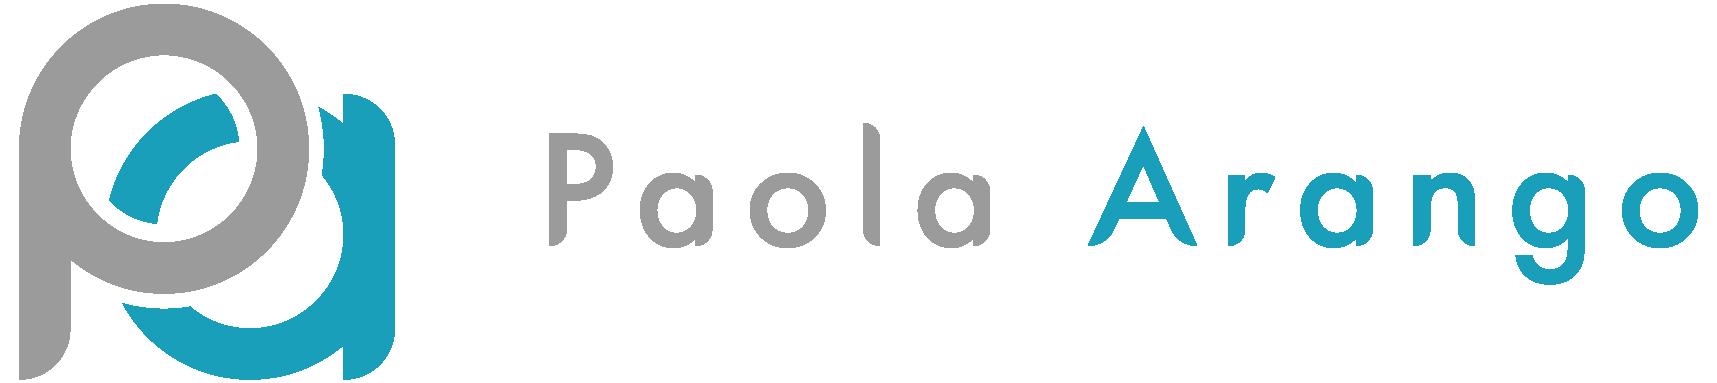 paola-arango-psicologia-talento-humano-desarrollo-organizacional-logo-3-05